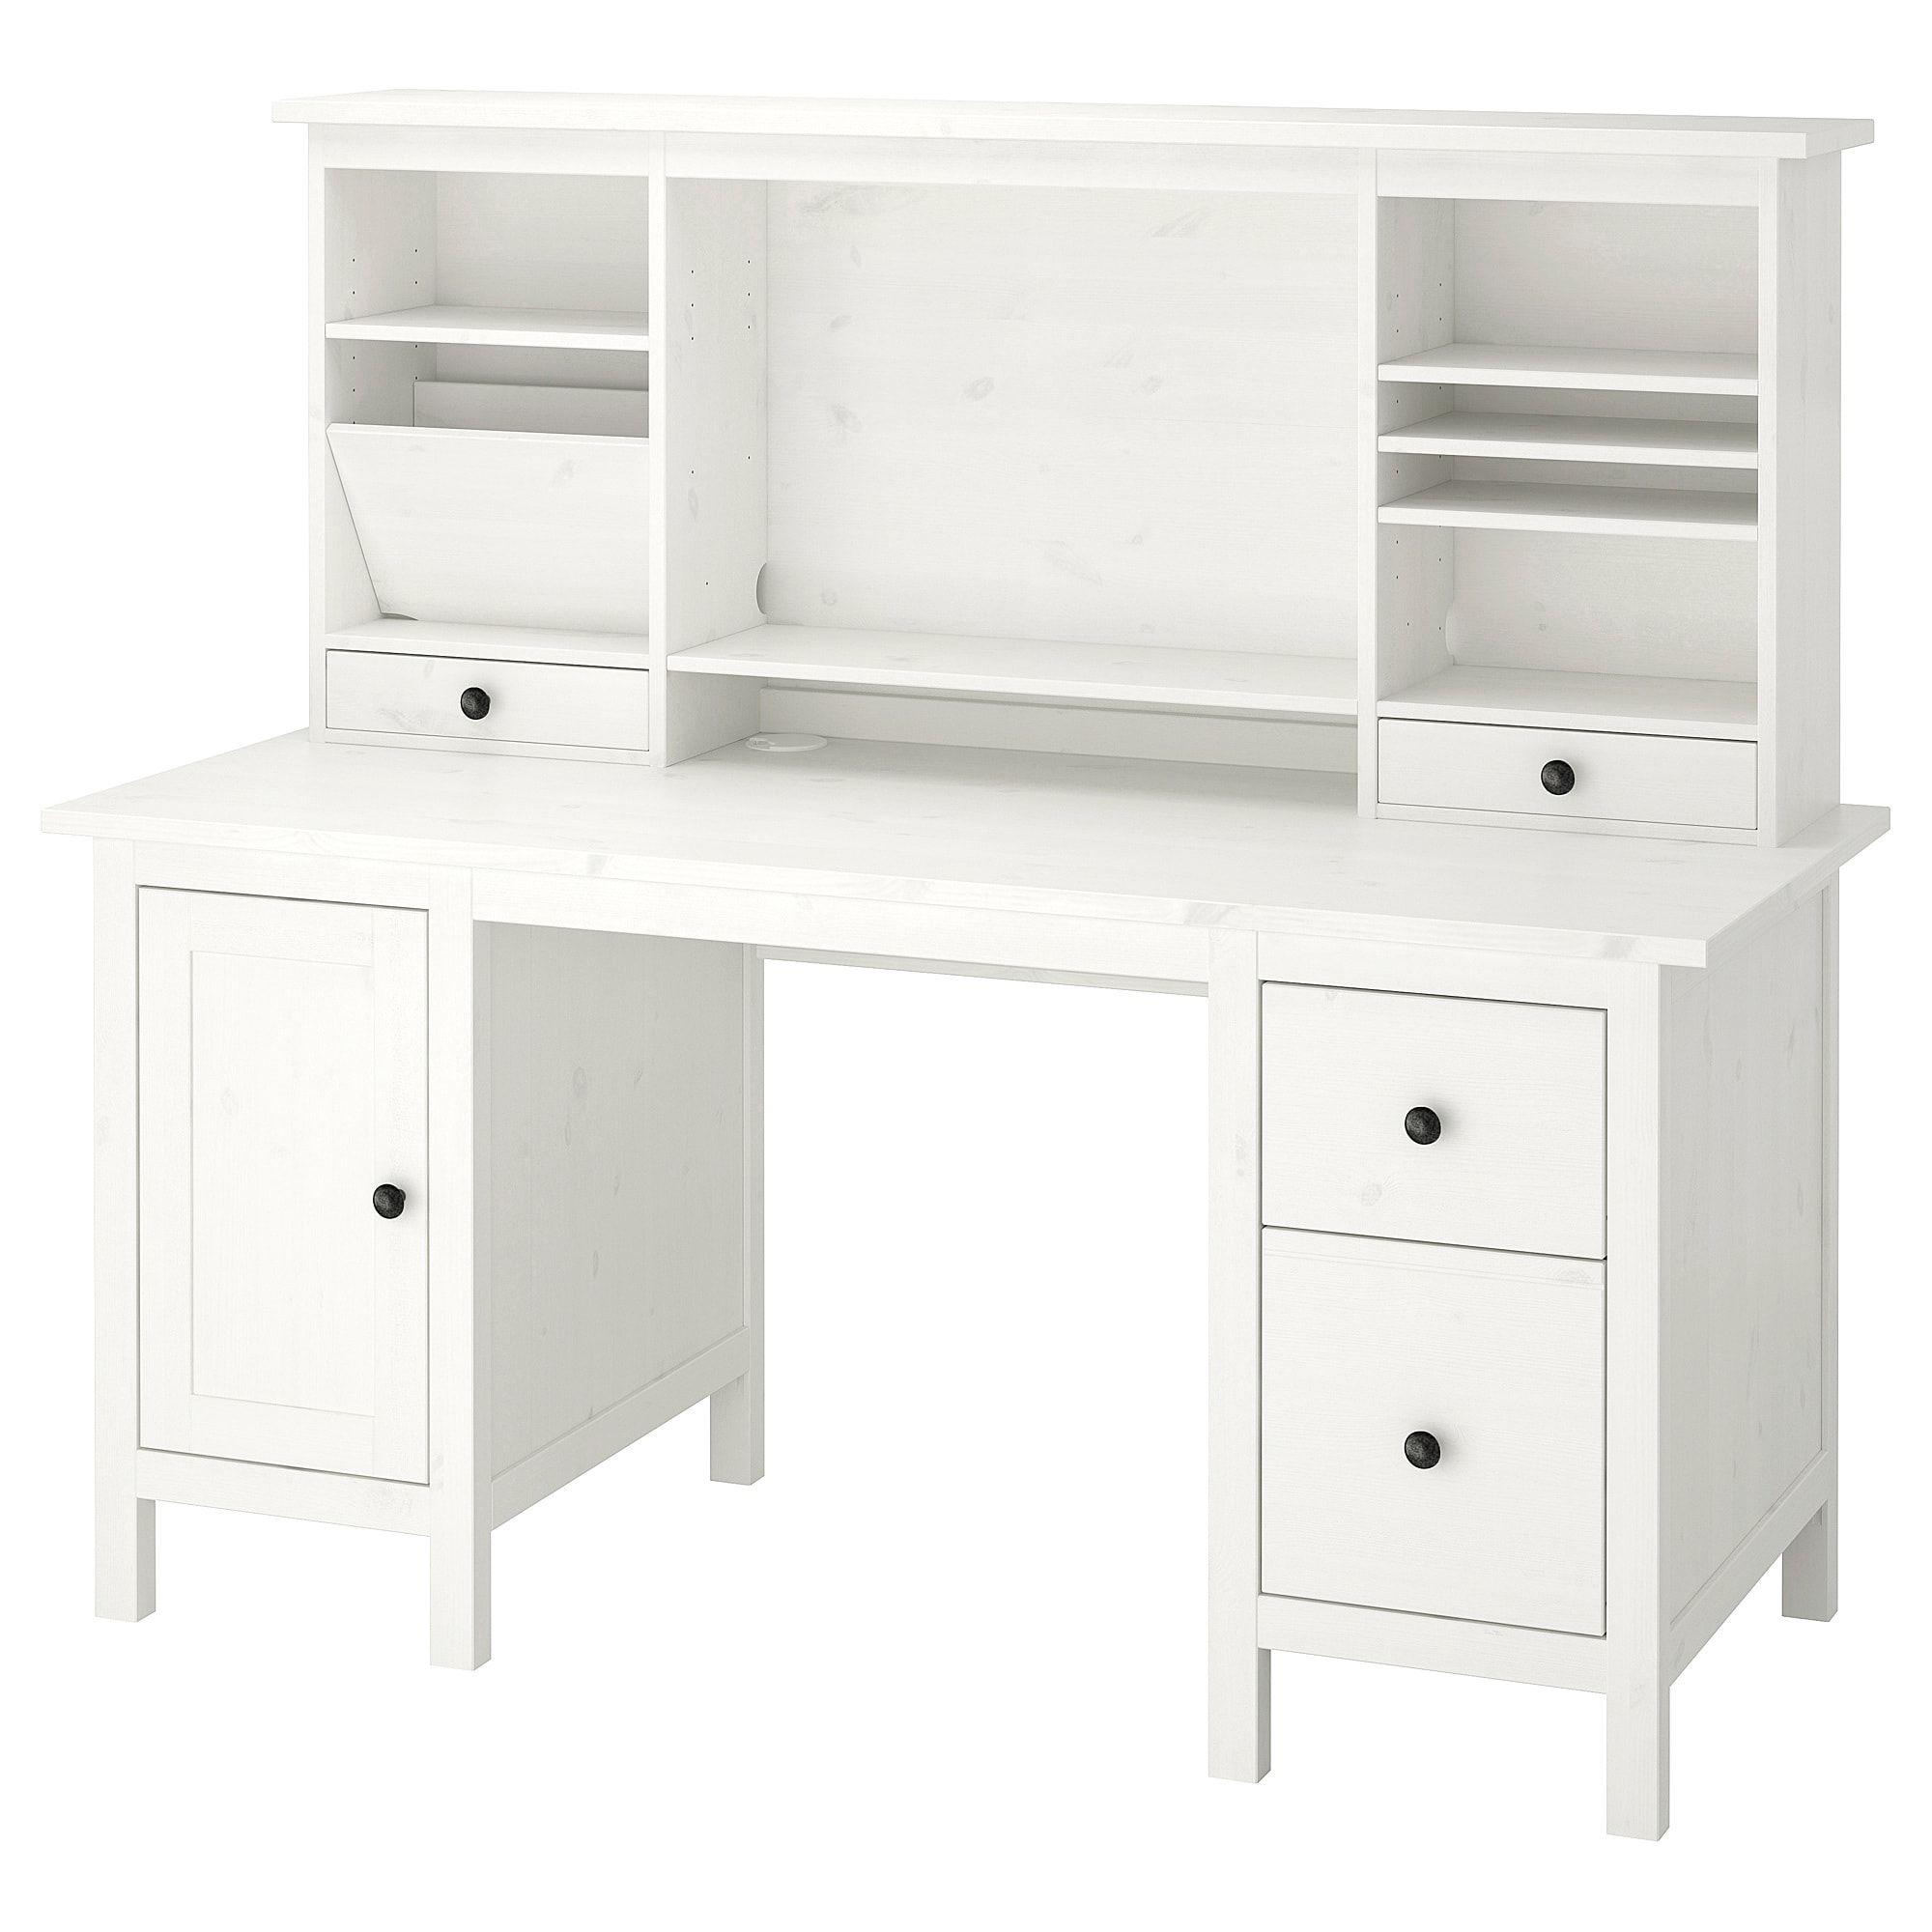 Hemnes White Stain Desk With Add On Unit 155x137 Cm Ikea In 2020 Hemnes Desk Storage White Desk With Drawers